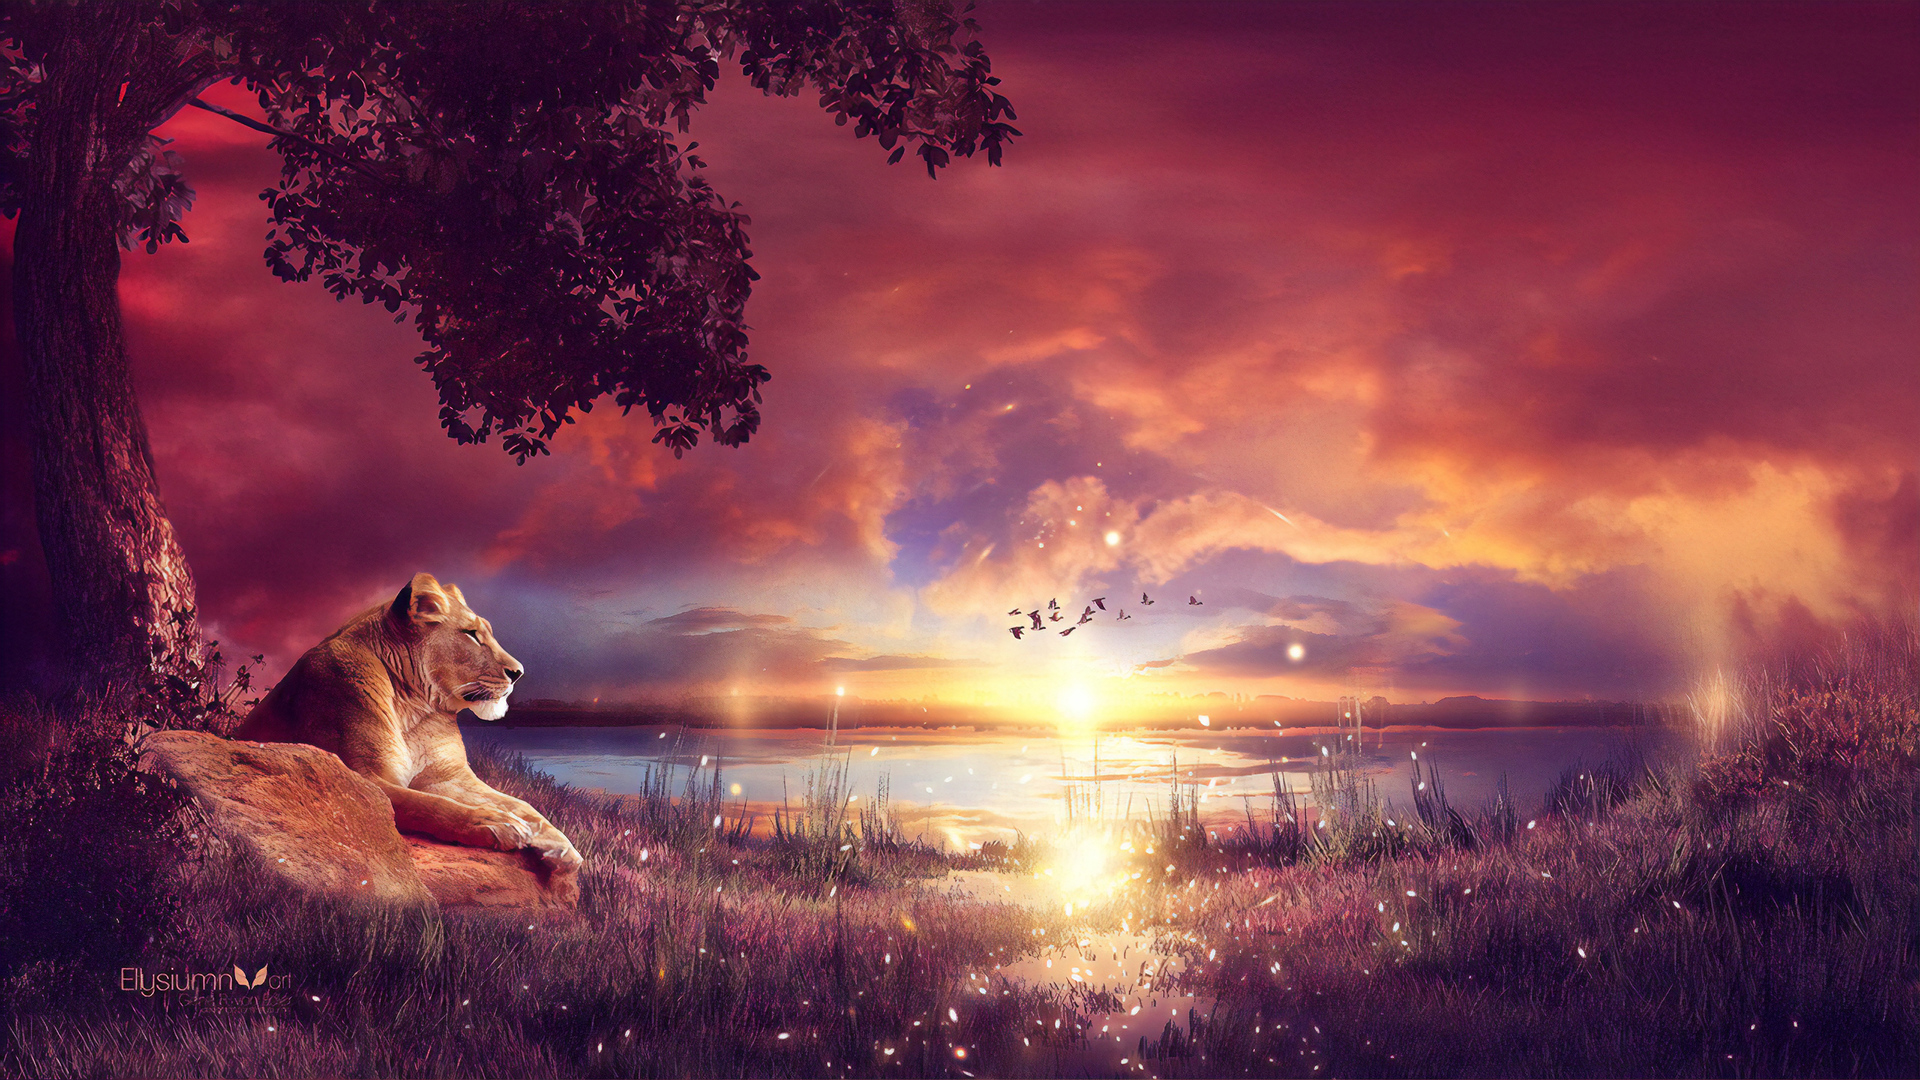 king-enjoying-the-sunset-q6.jpg